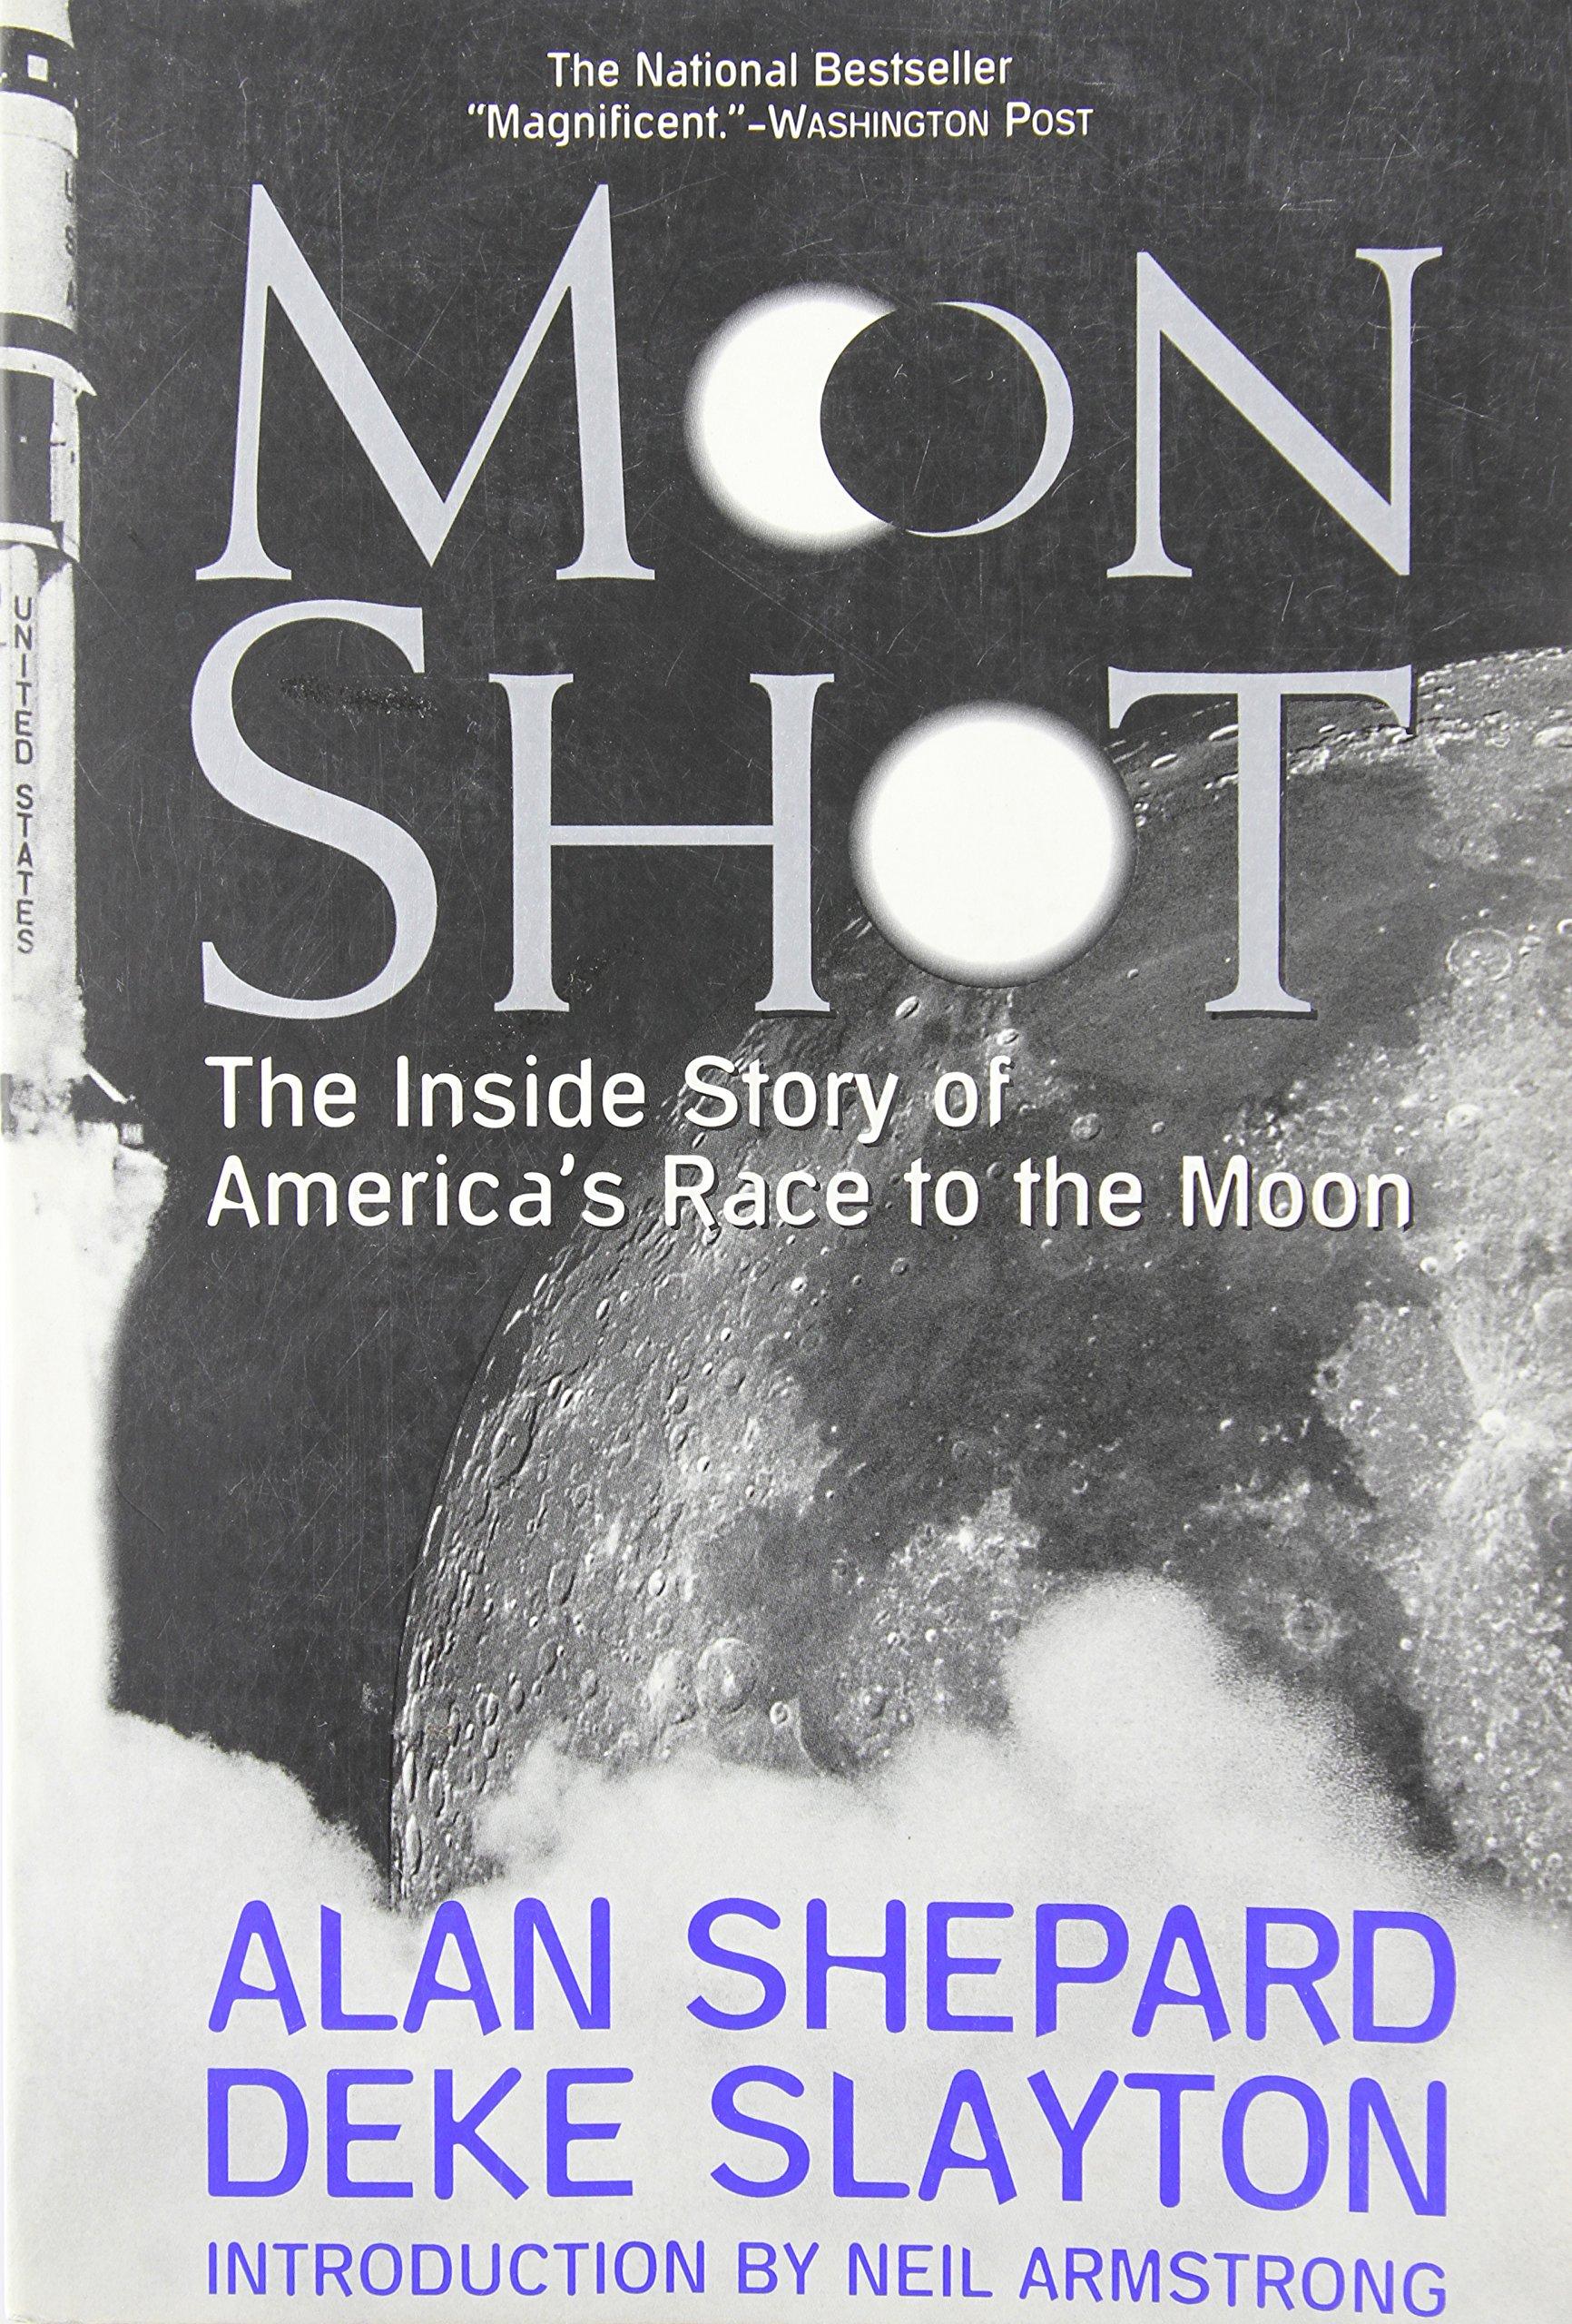 Moon Shot: The Inside Story of America's Race to the Moon: Alan Shepard,  Deke Slayton: 9781570361678: Amazon.com: Books